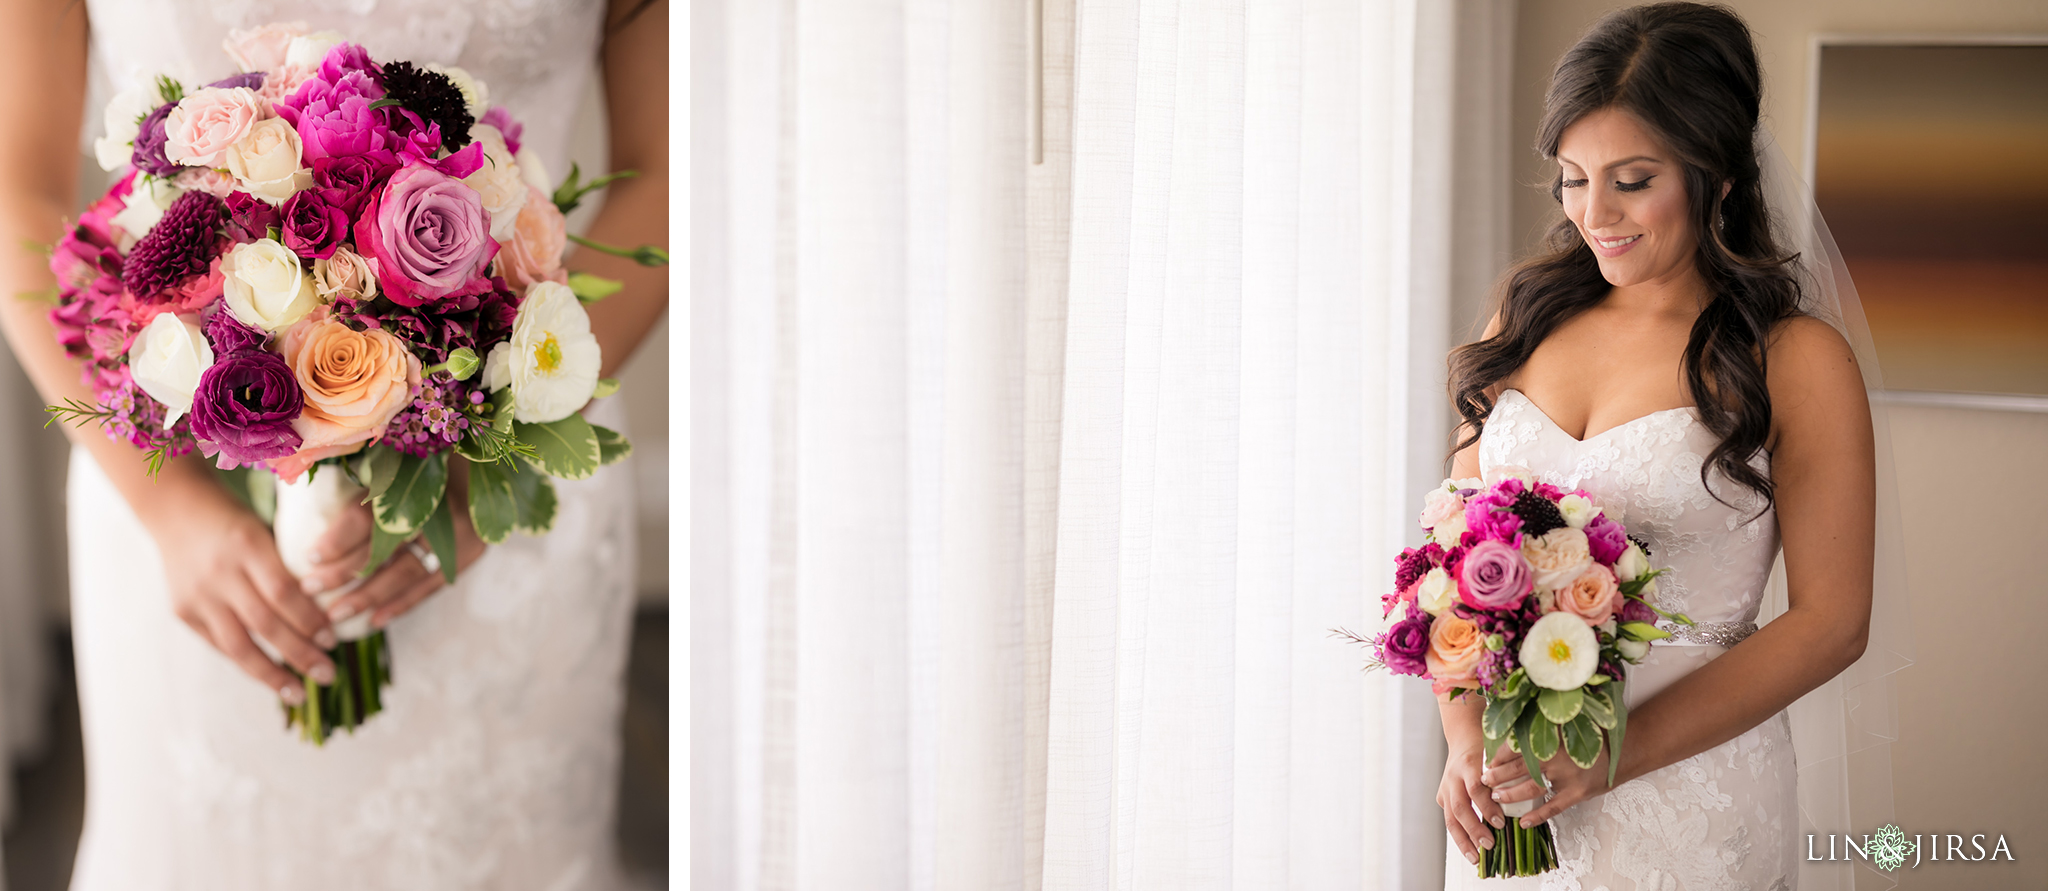 07-newport-beach-marriott-wedding-photography